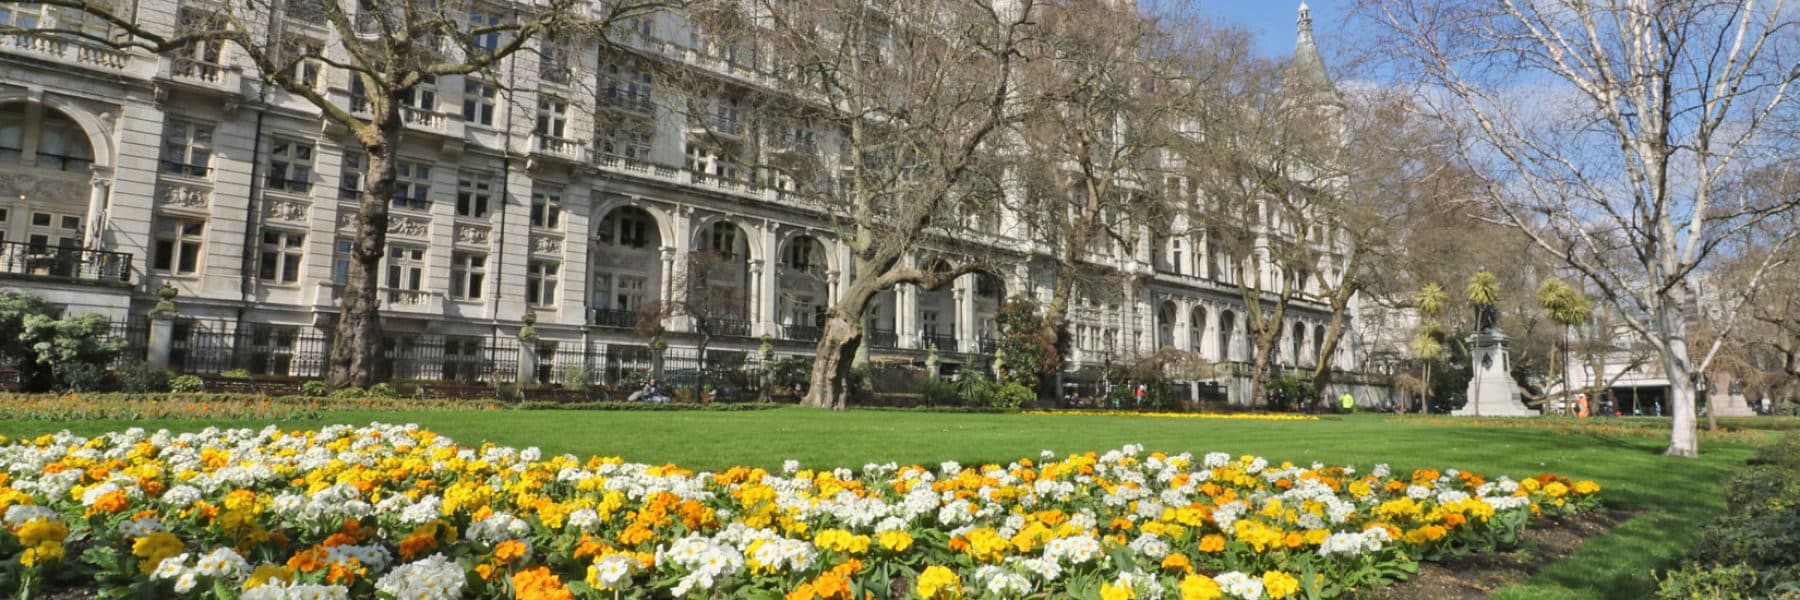 Whitehall Gardens, Victoria Embankment Gardens, City of Westminster